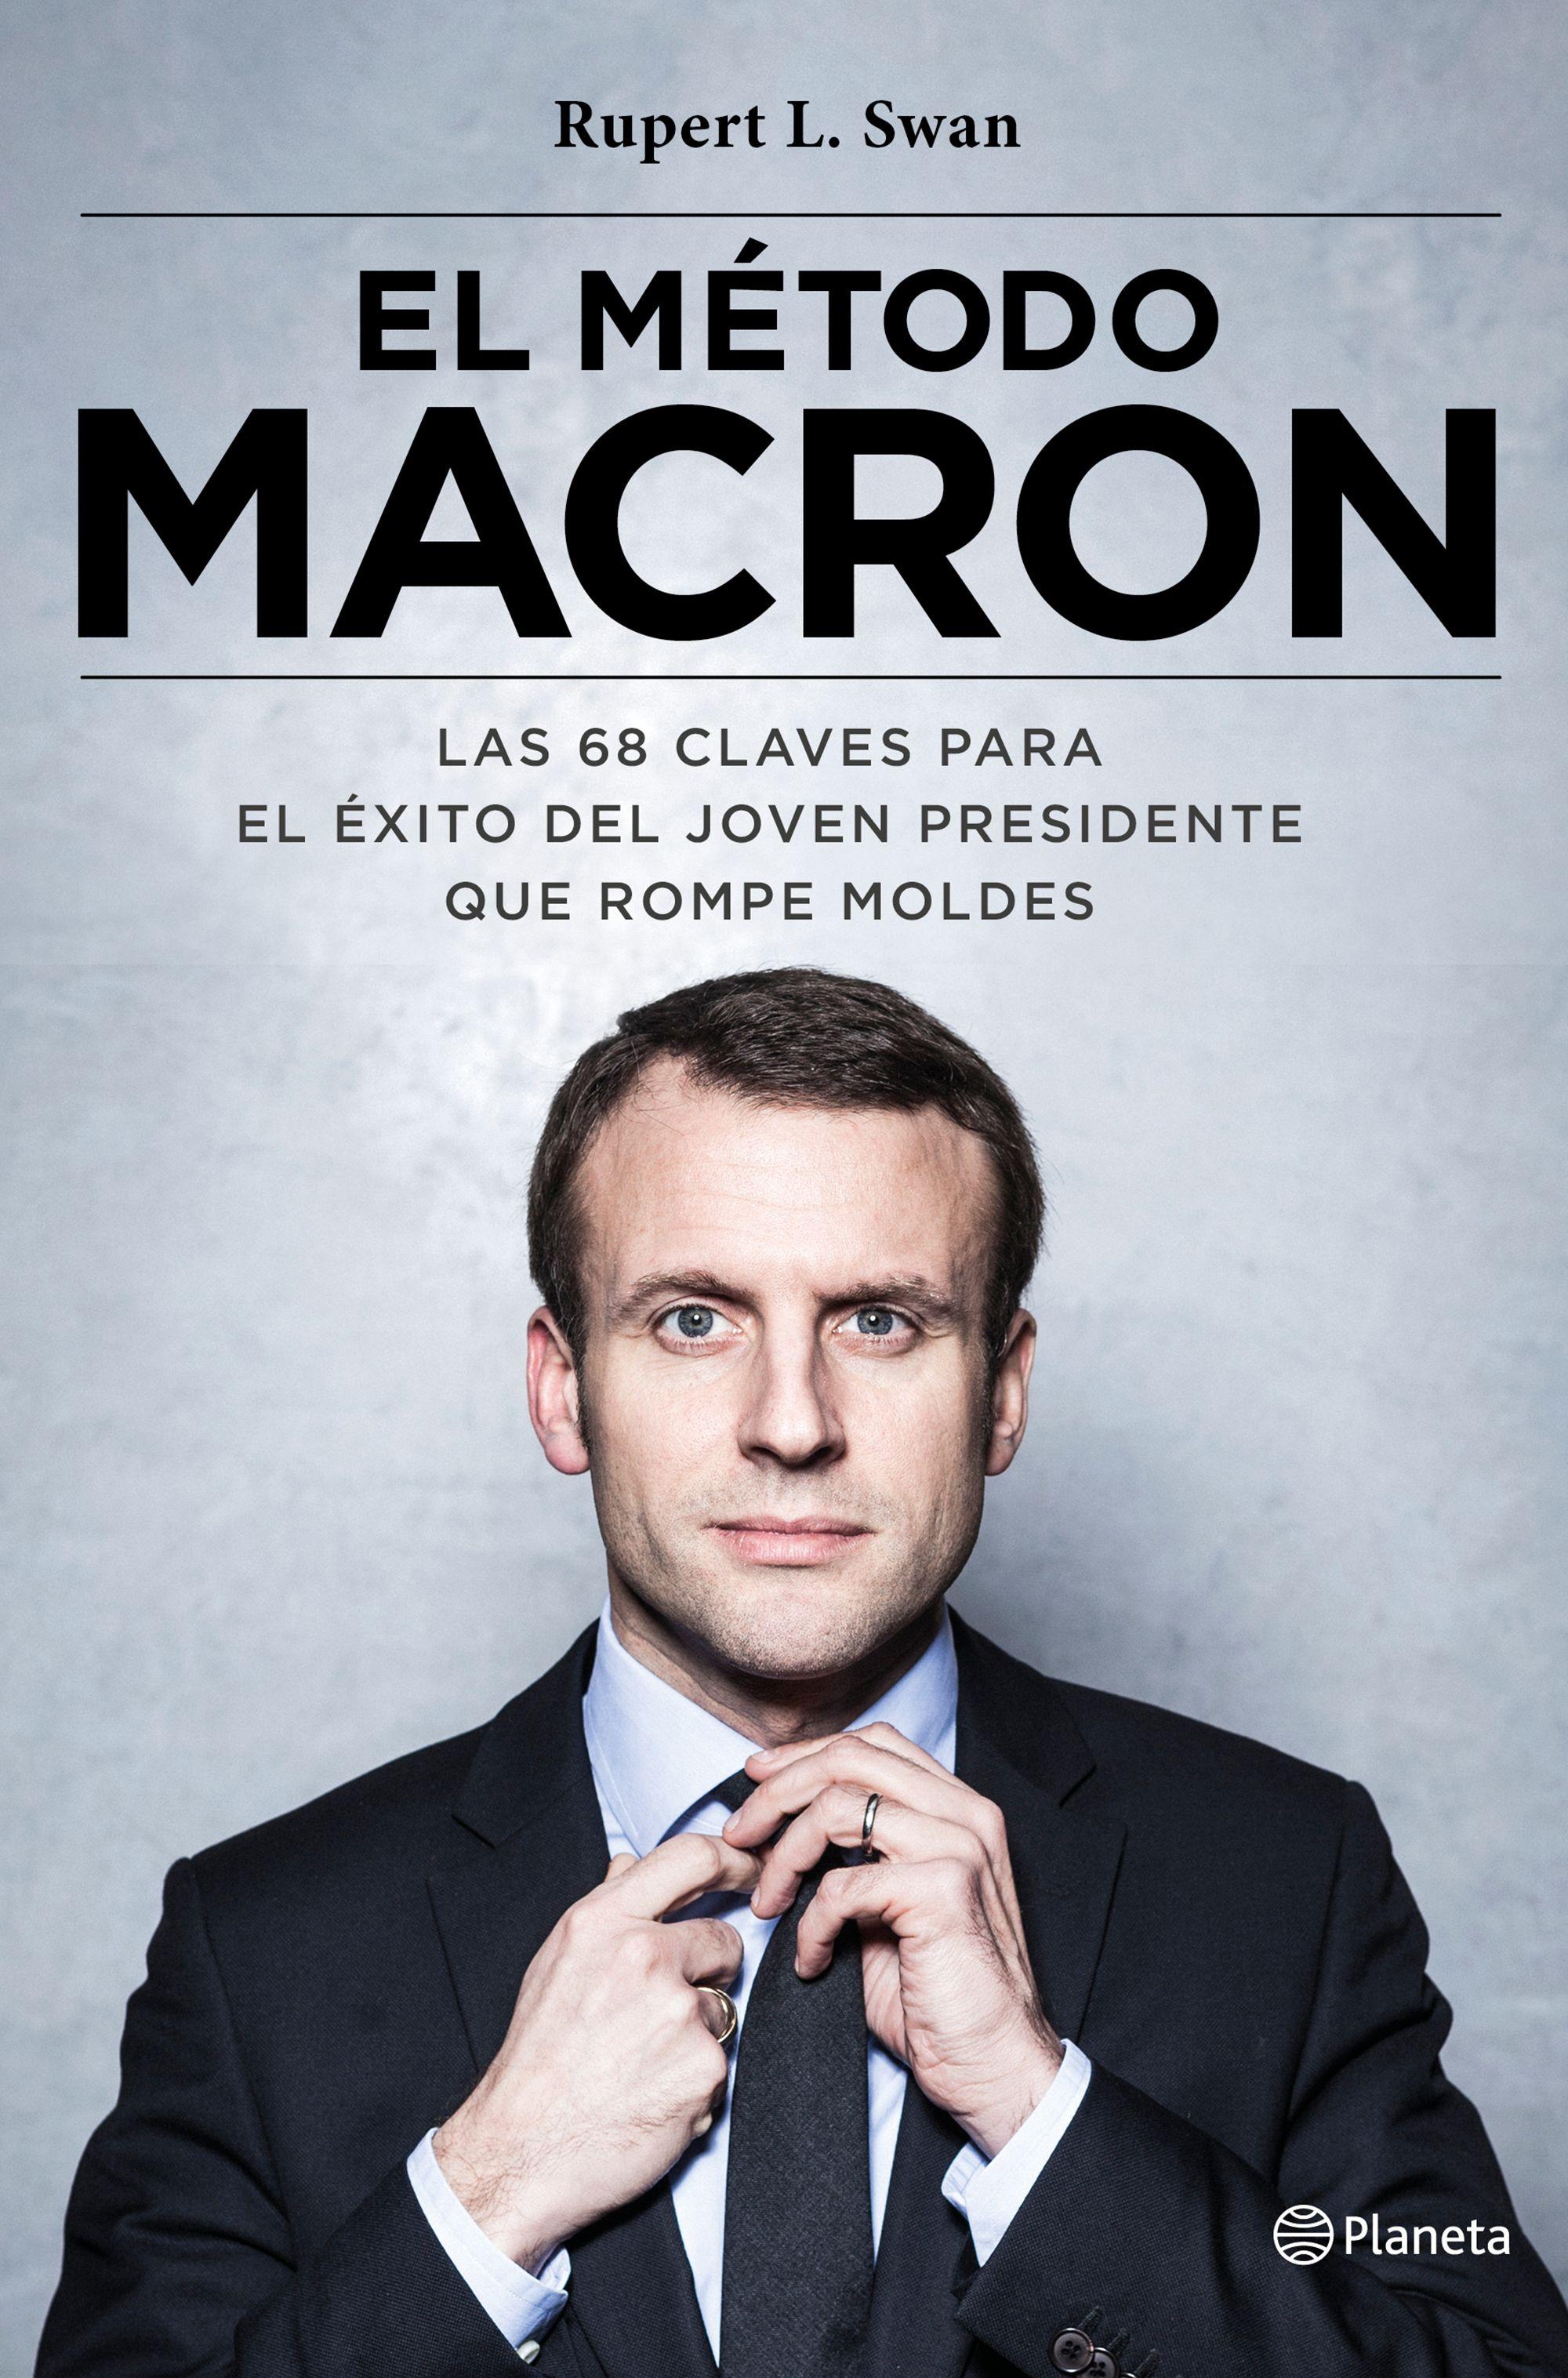 El Método Macron - Rupert L. Swan - Planeta